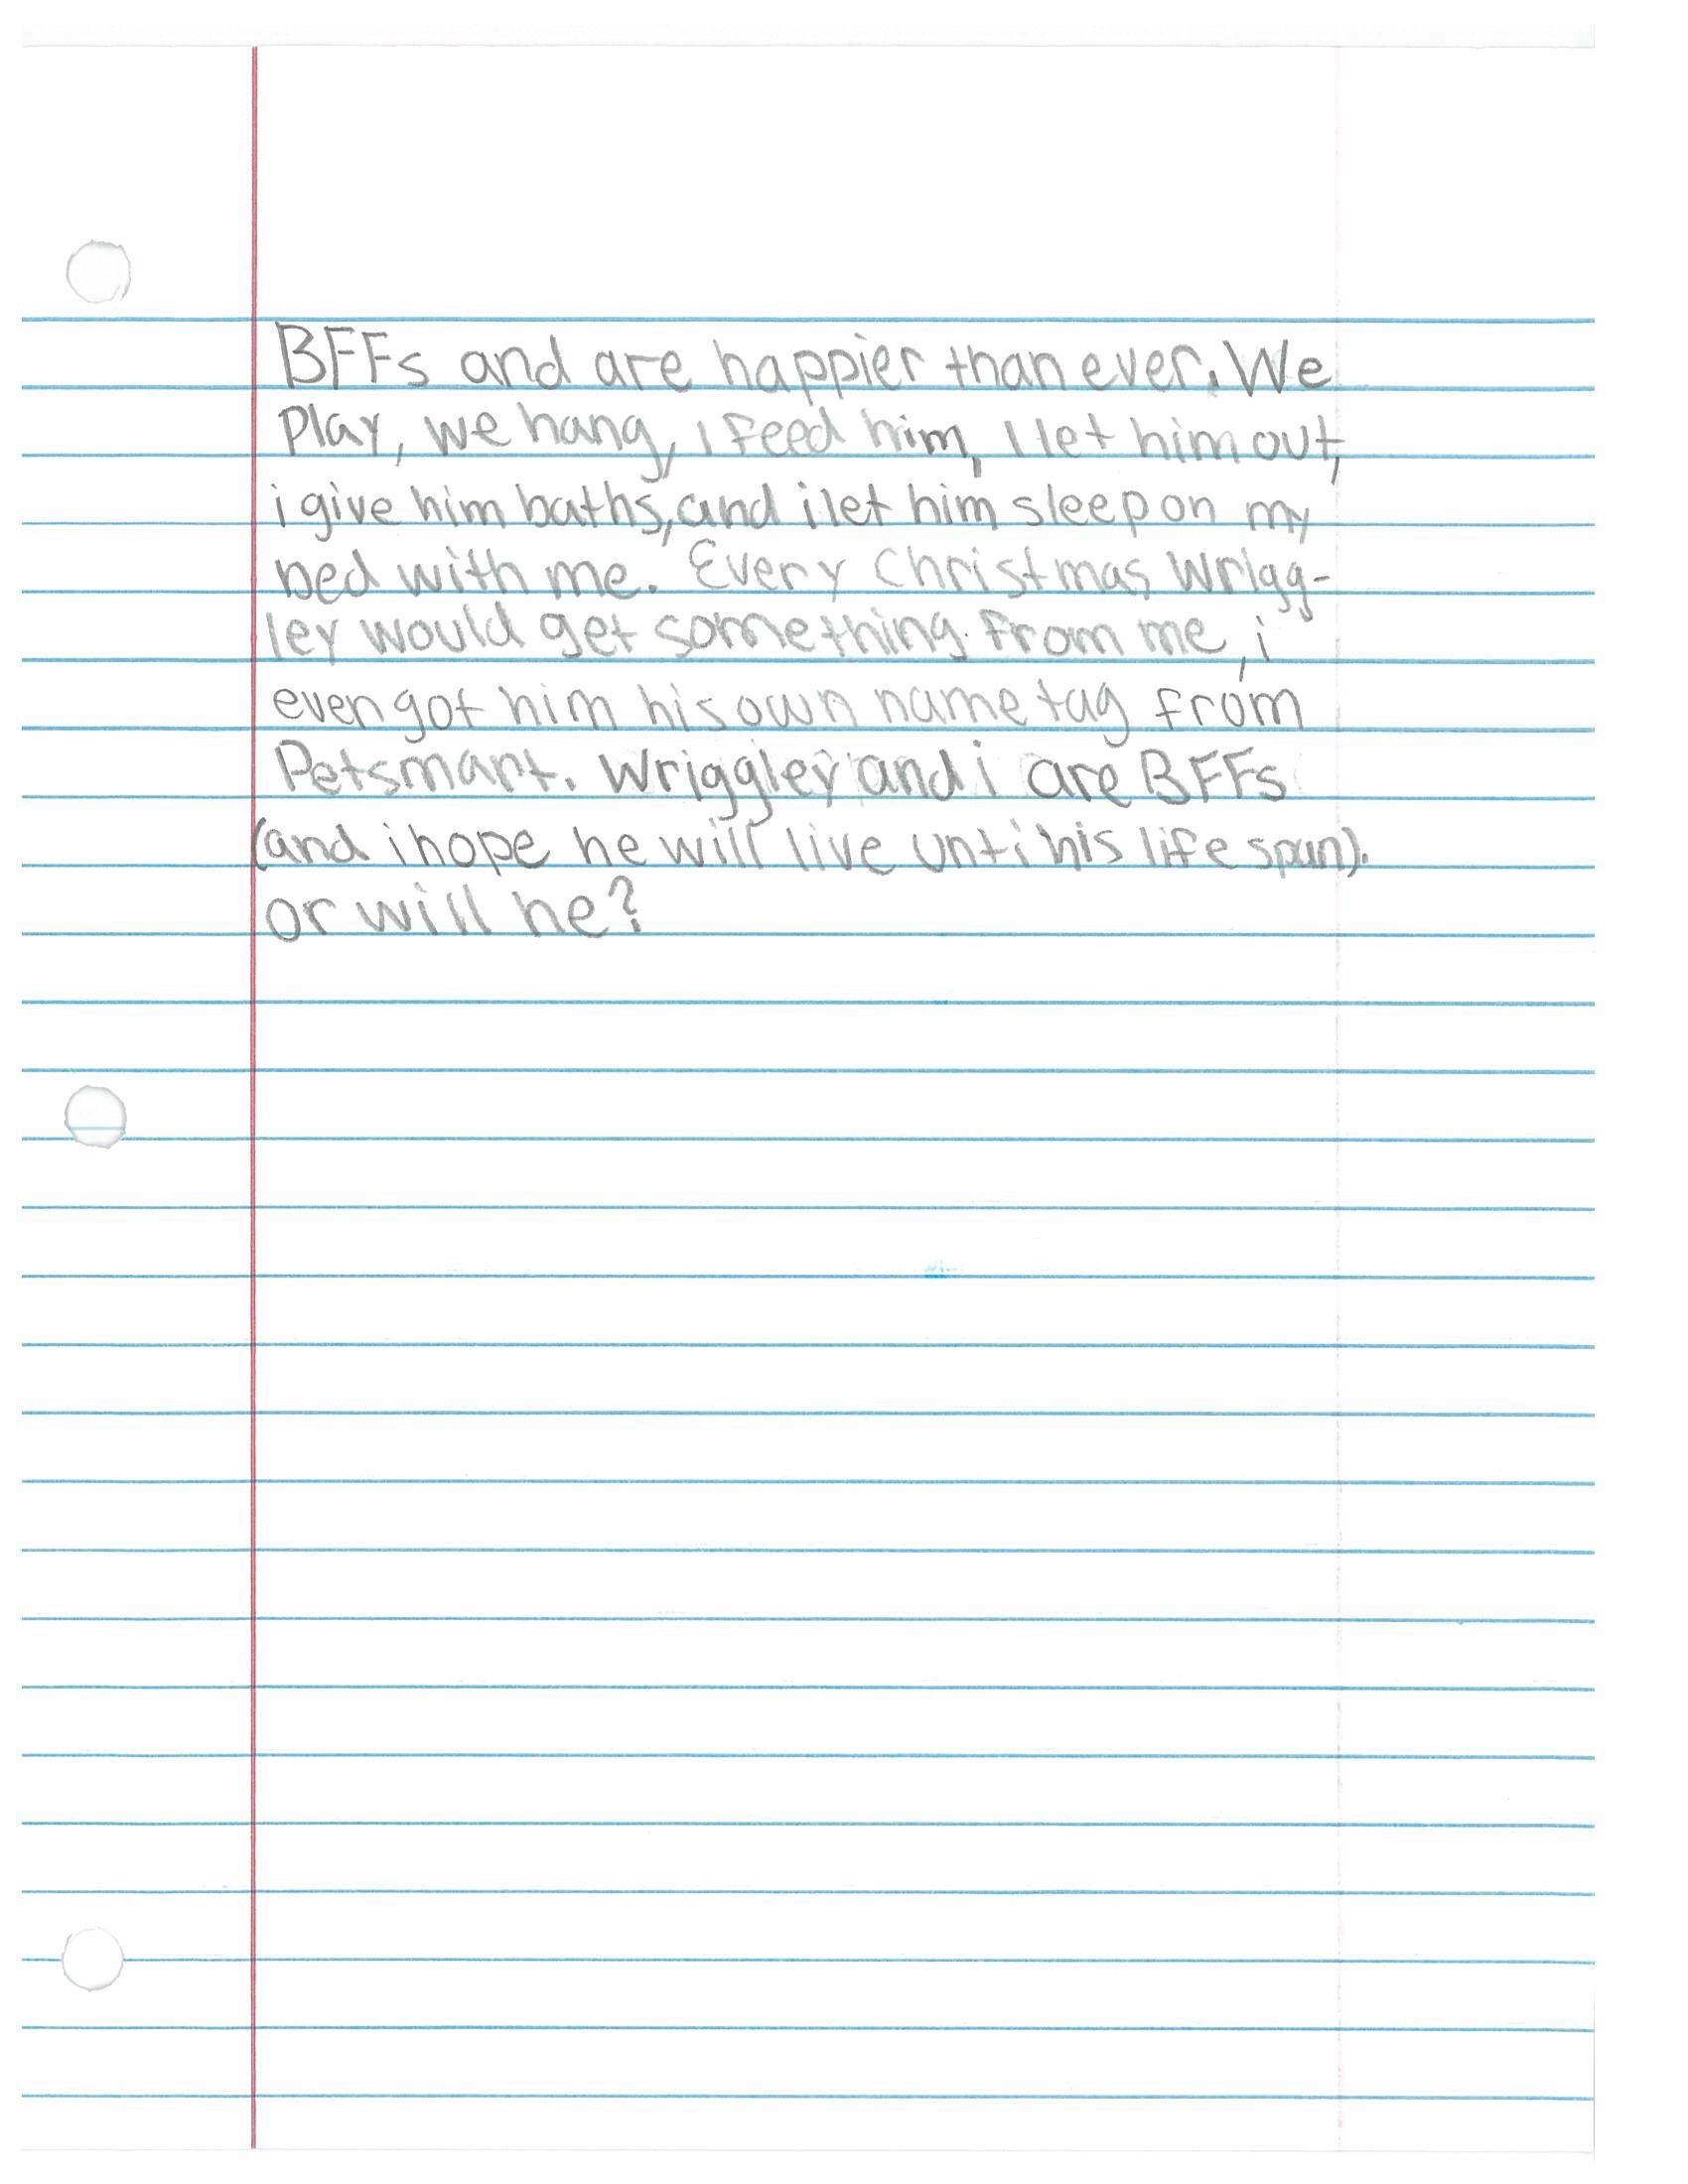 Argumentative Essay Peer Review Sheet Urinalysis